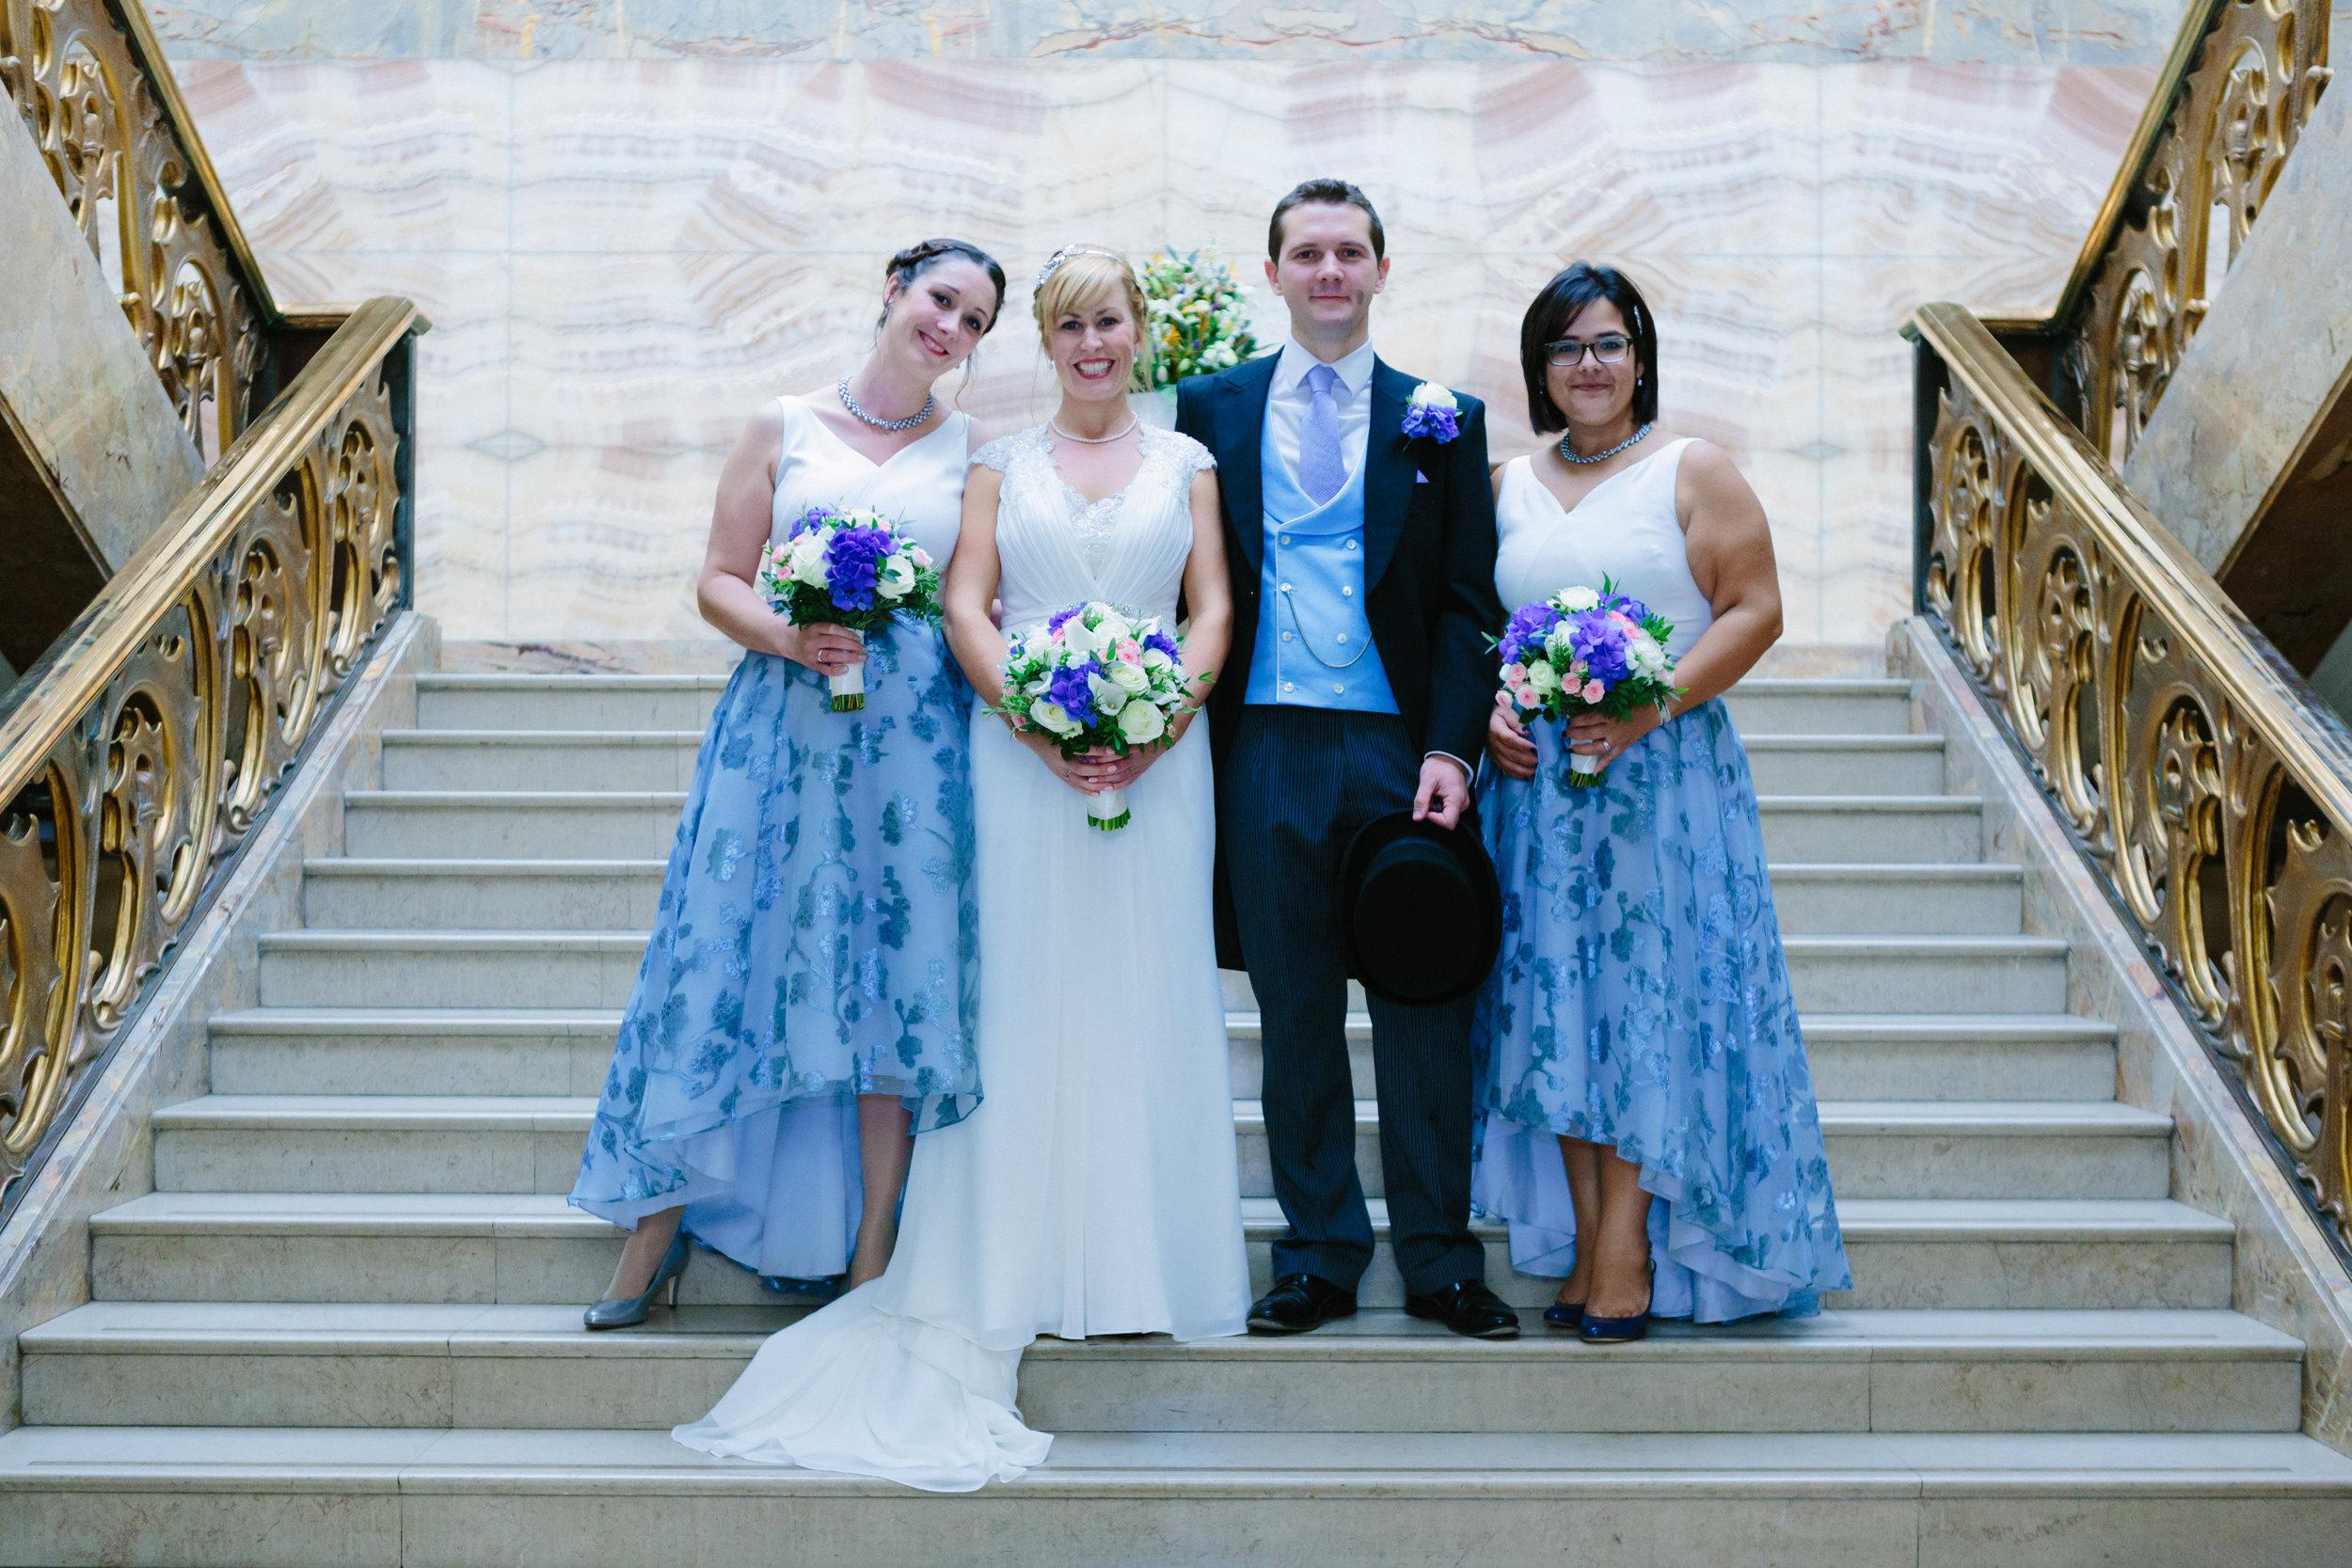 london-wedding-photography-wimbledon-wandsworth-town-hall-savoy-hotel-group-portrait-41